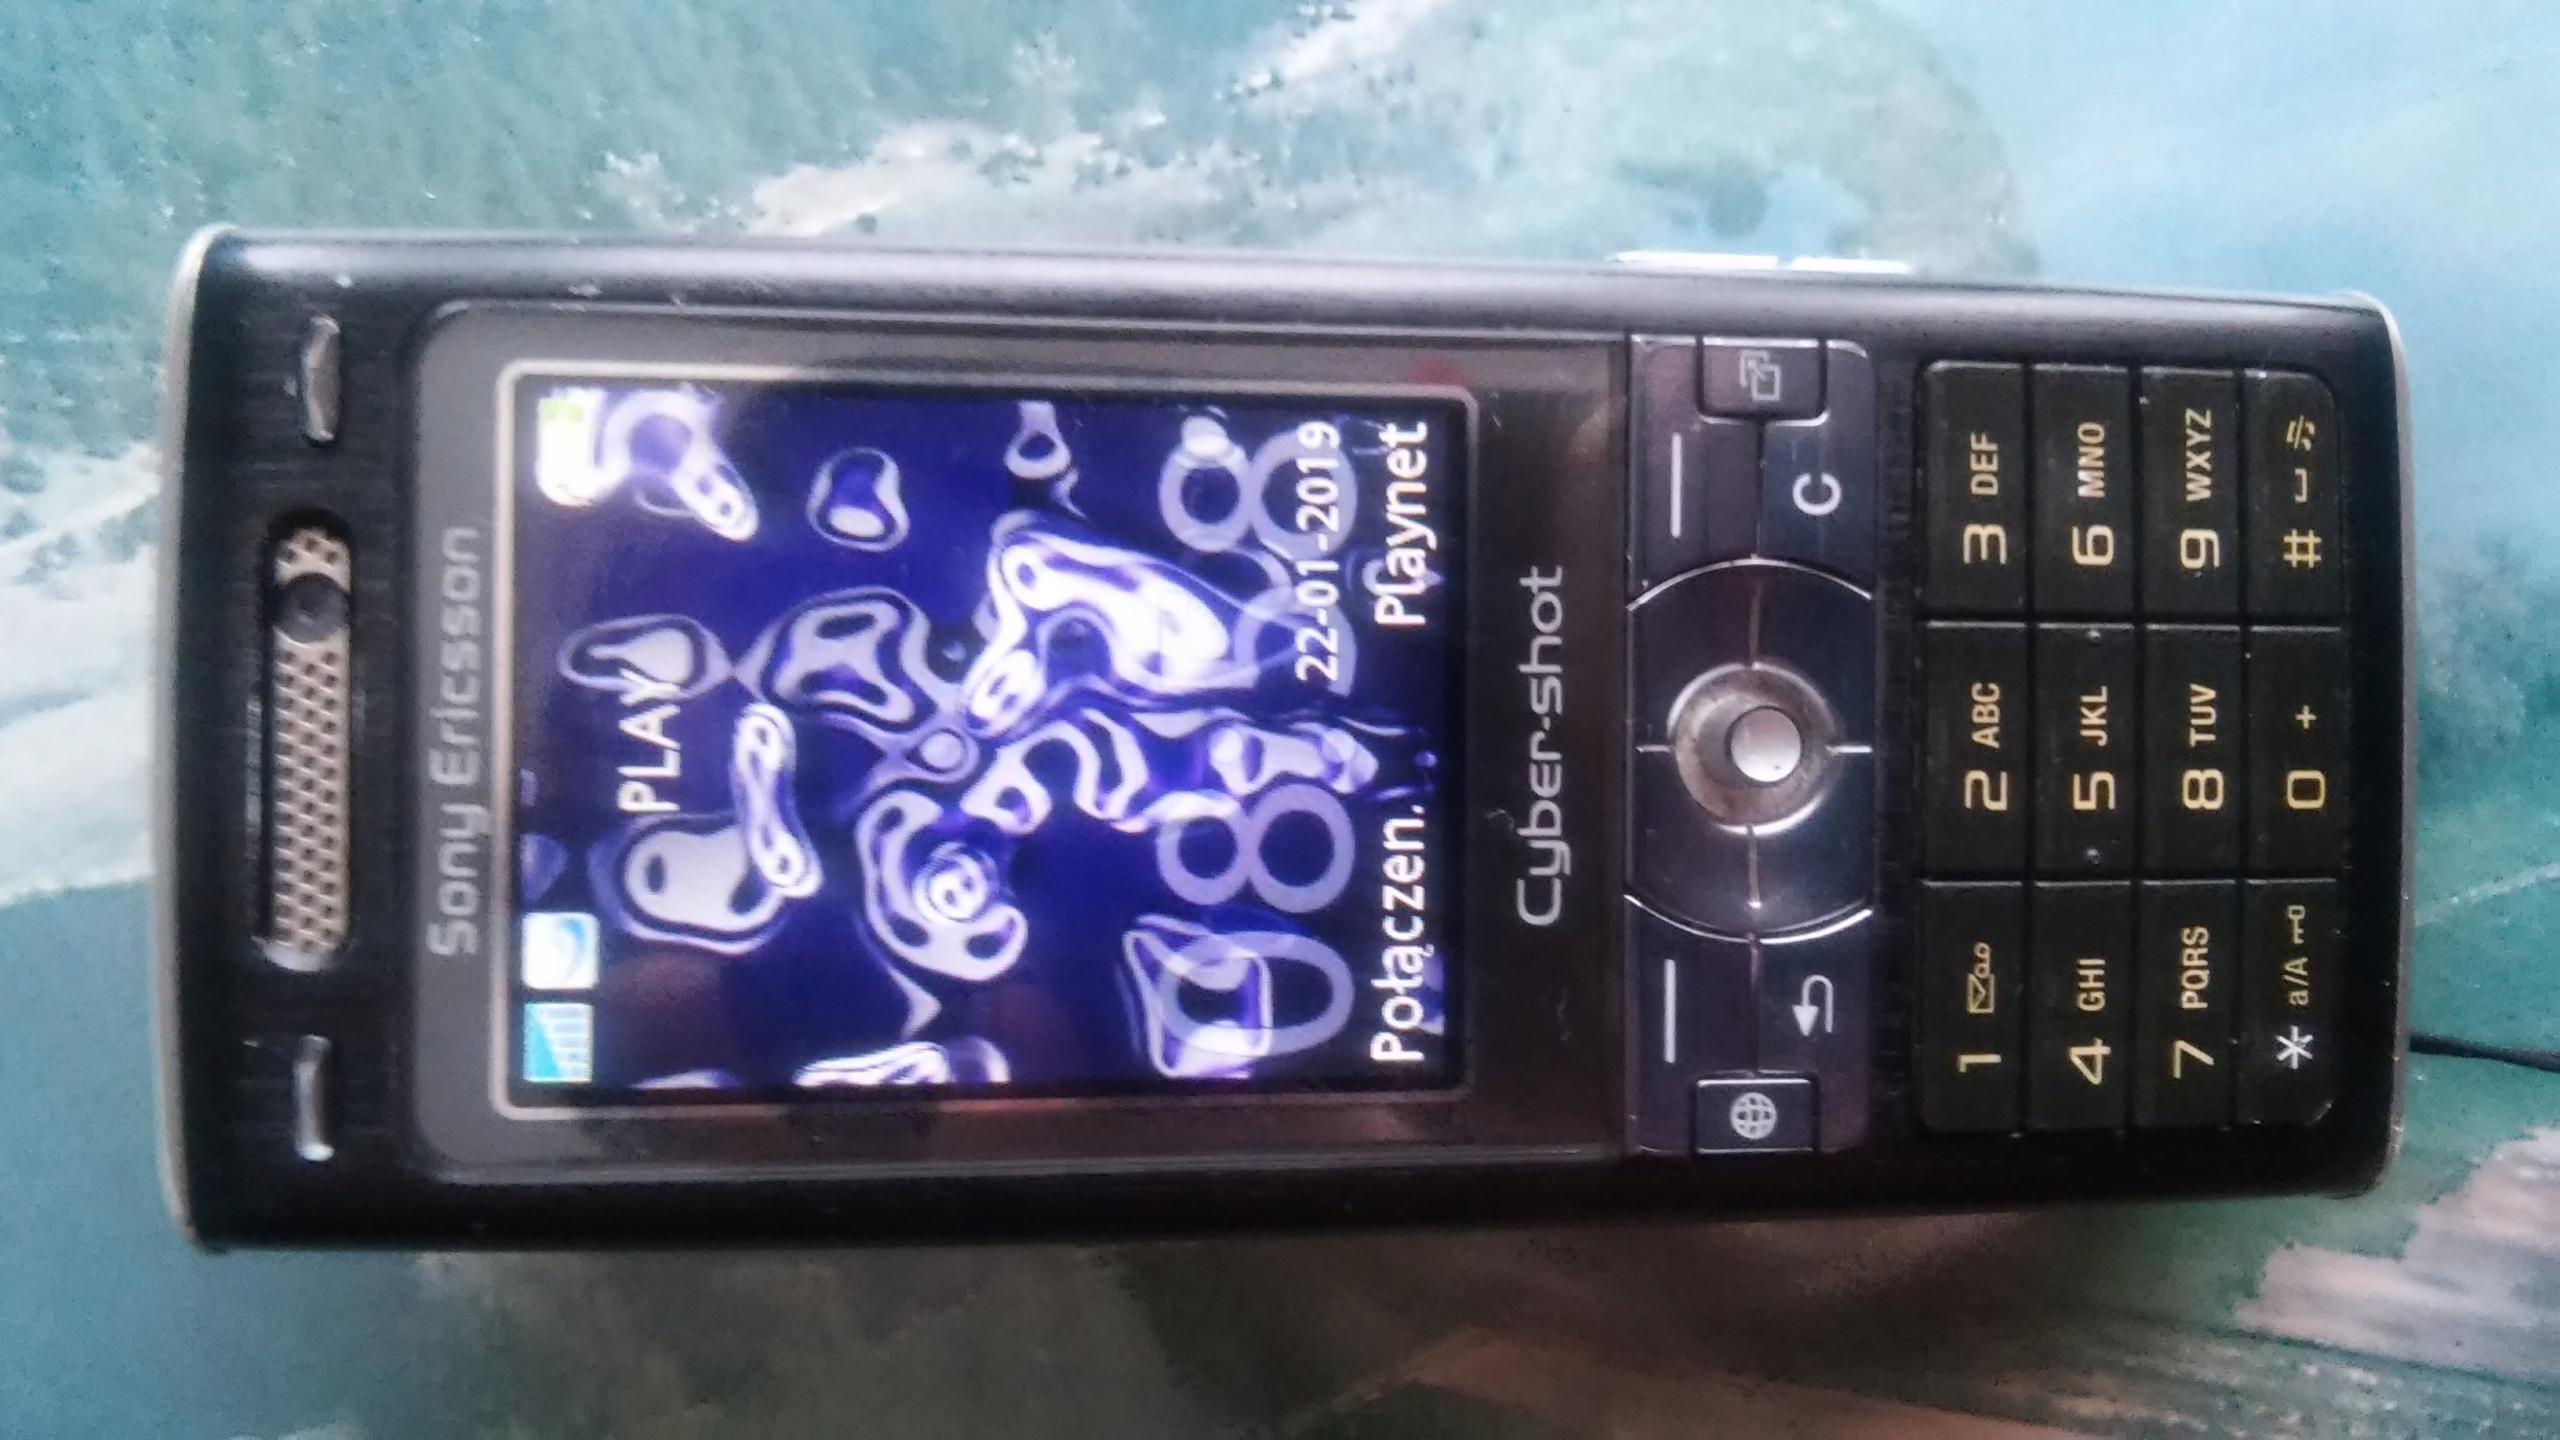 Sony Ericsson K800i 100% sprawny